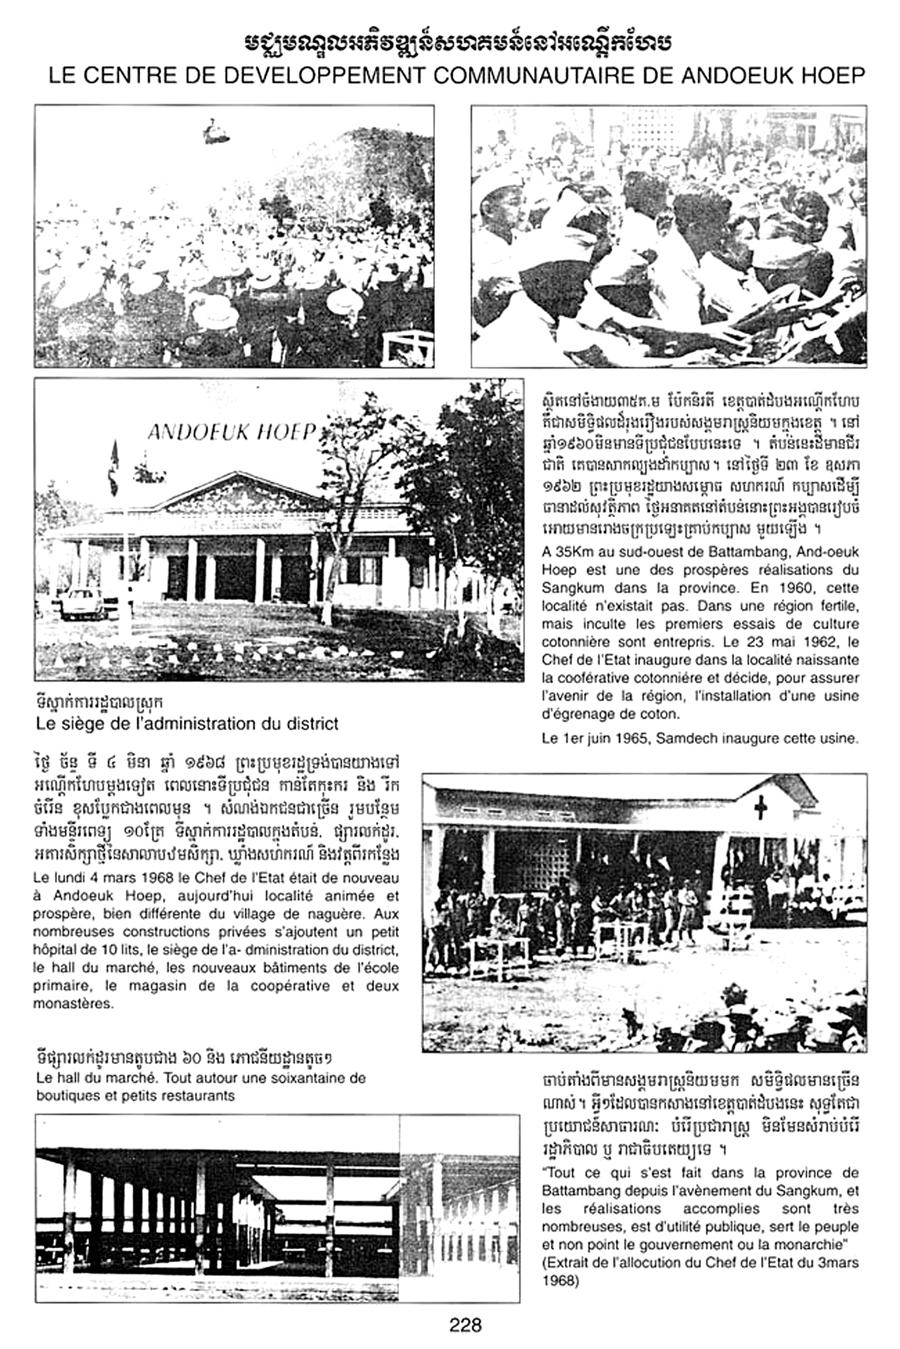 All/history/Histoire/SangkumReastrNiyum/SangkumReastrNiyum/id1758/photo007.jpg